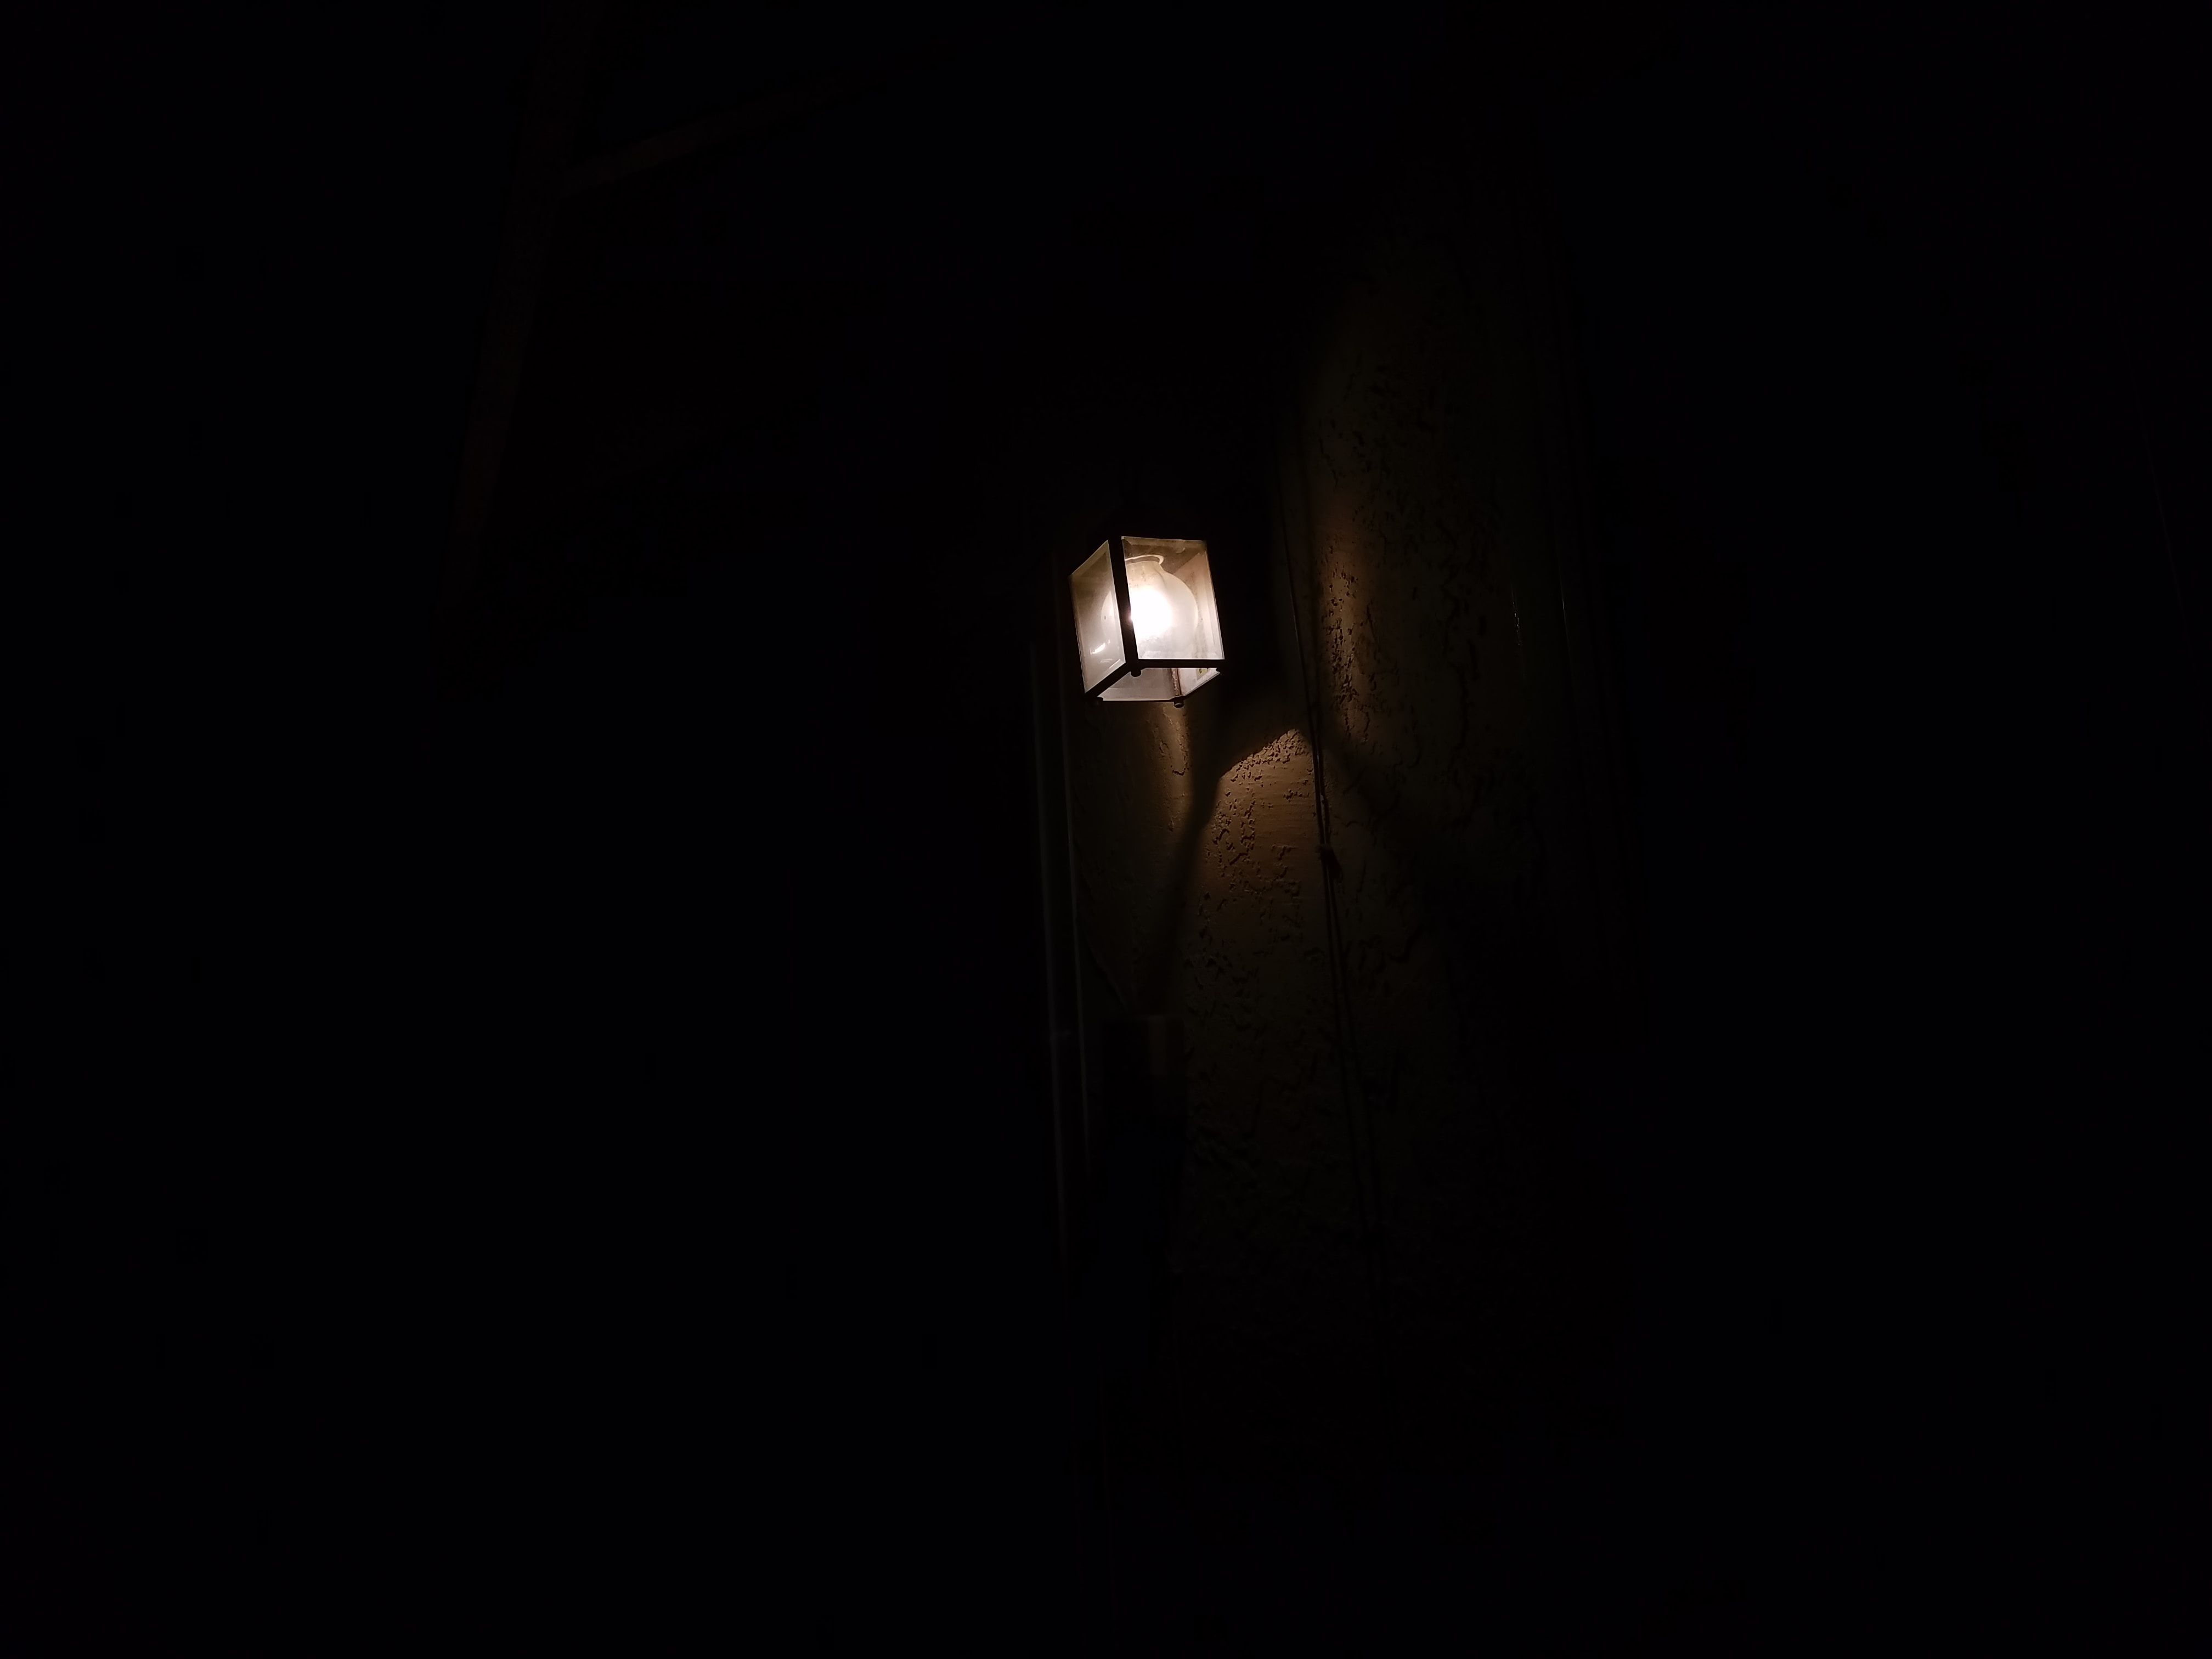 151530 download wallpaper Dark, Lamp, Lantern, Lighting, Illumination, Glow, Darkness screensavers and pictures for free